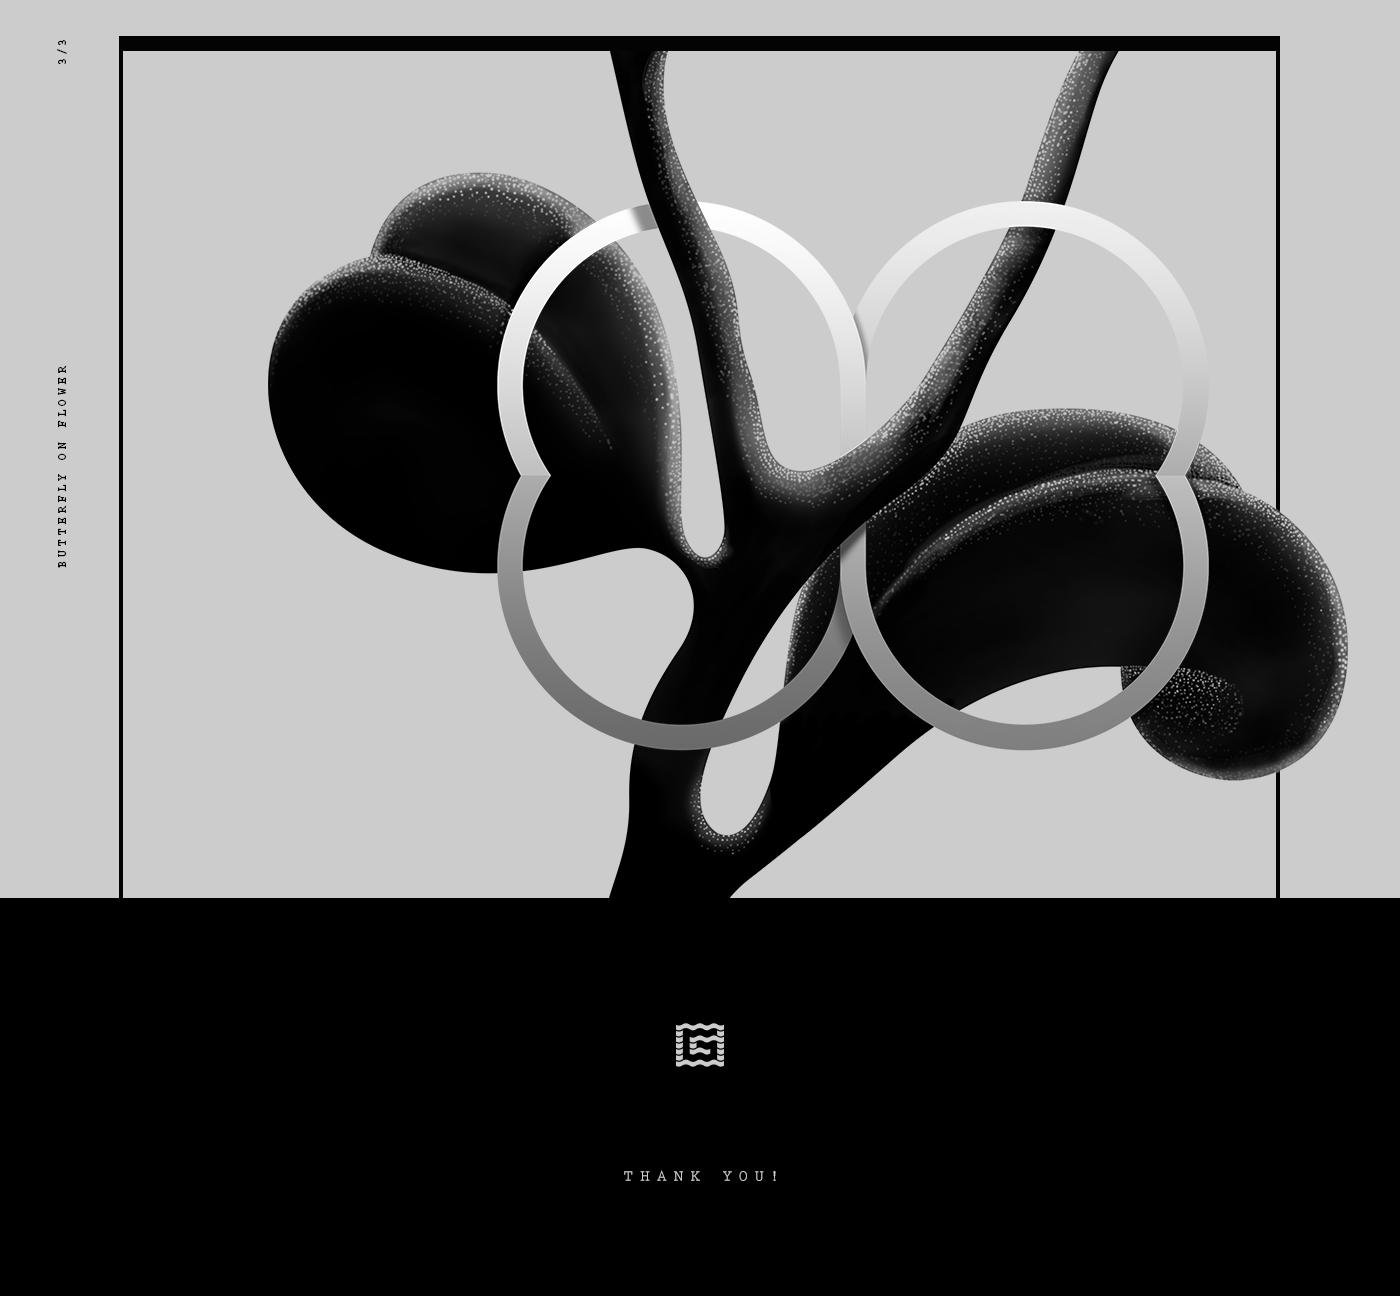 black yellow circle menu Icon dark print background video Responsive interaction logo minimalizm design studio full screen HD